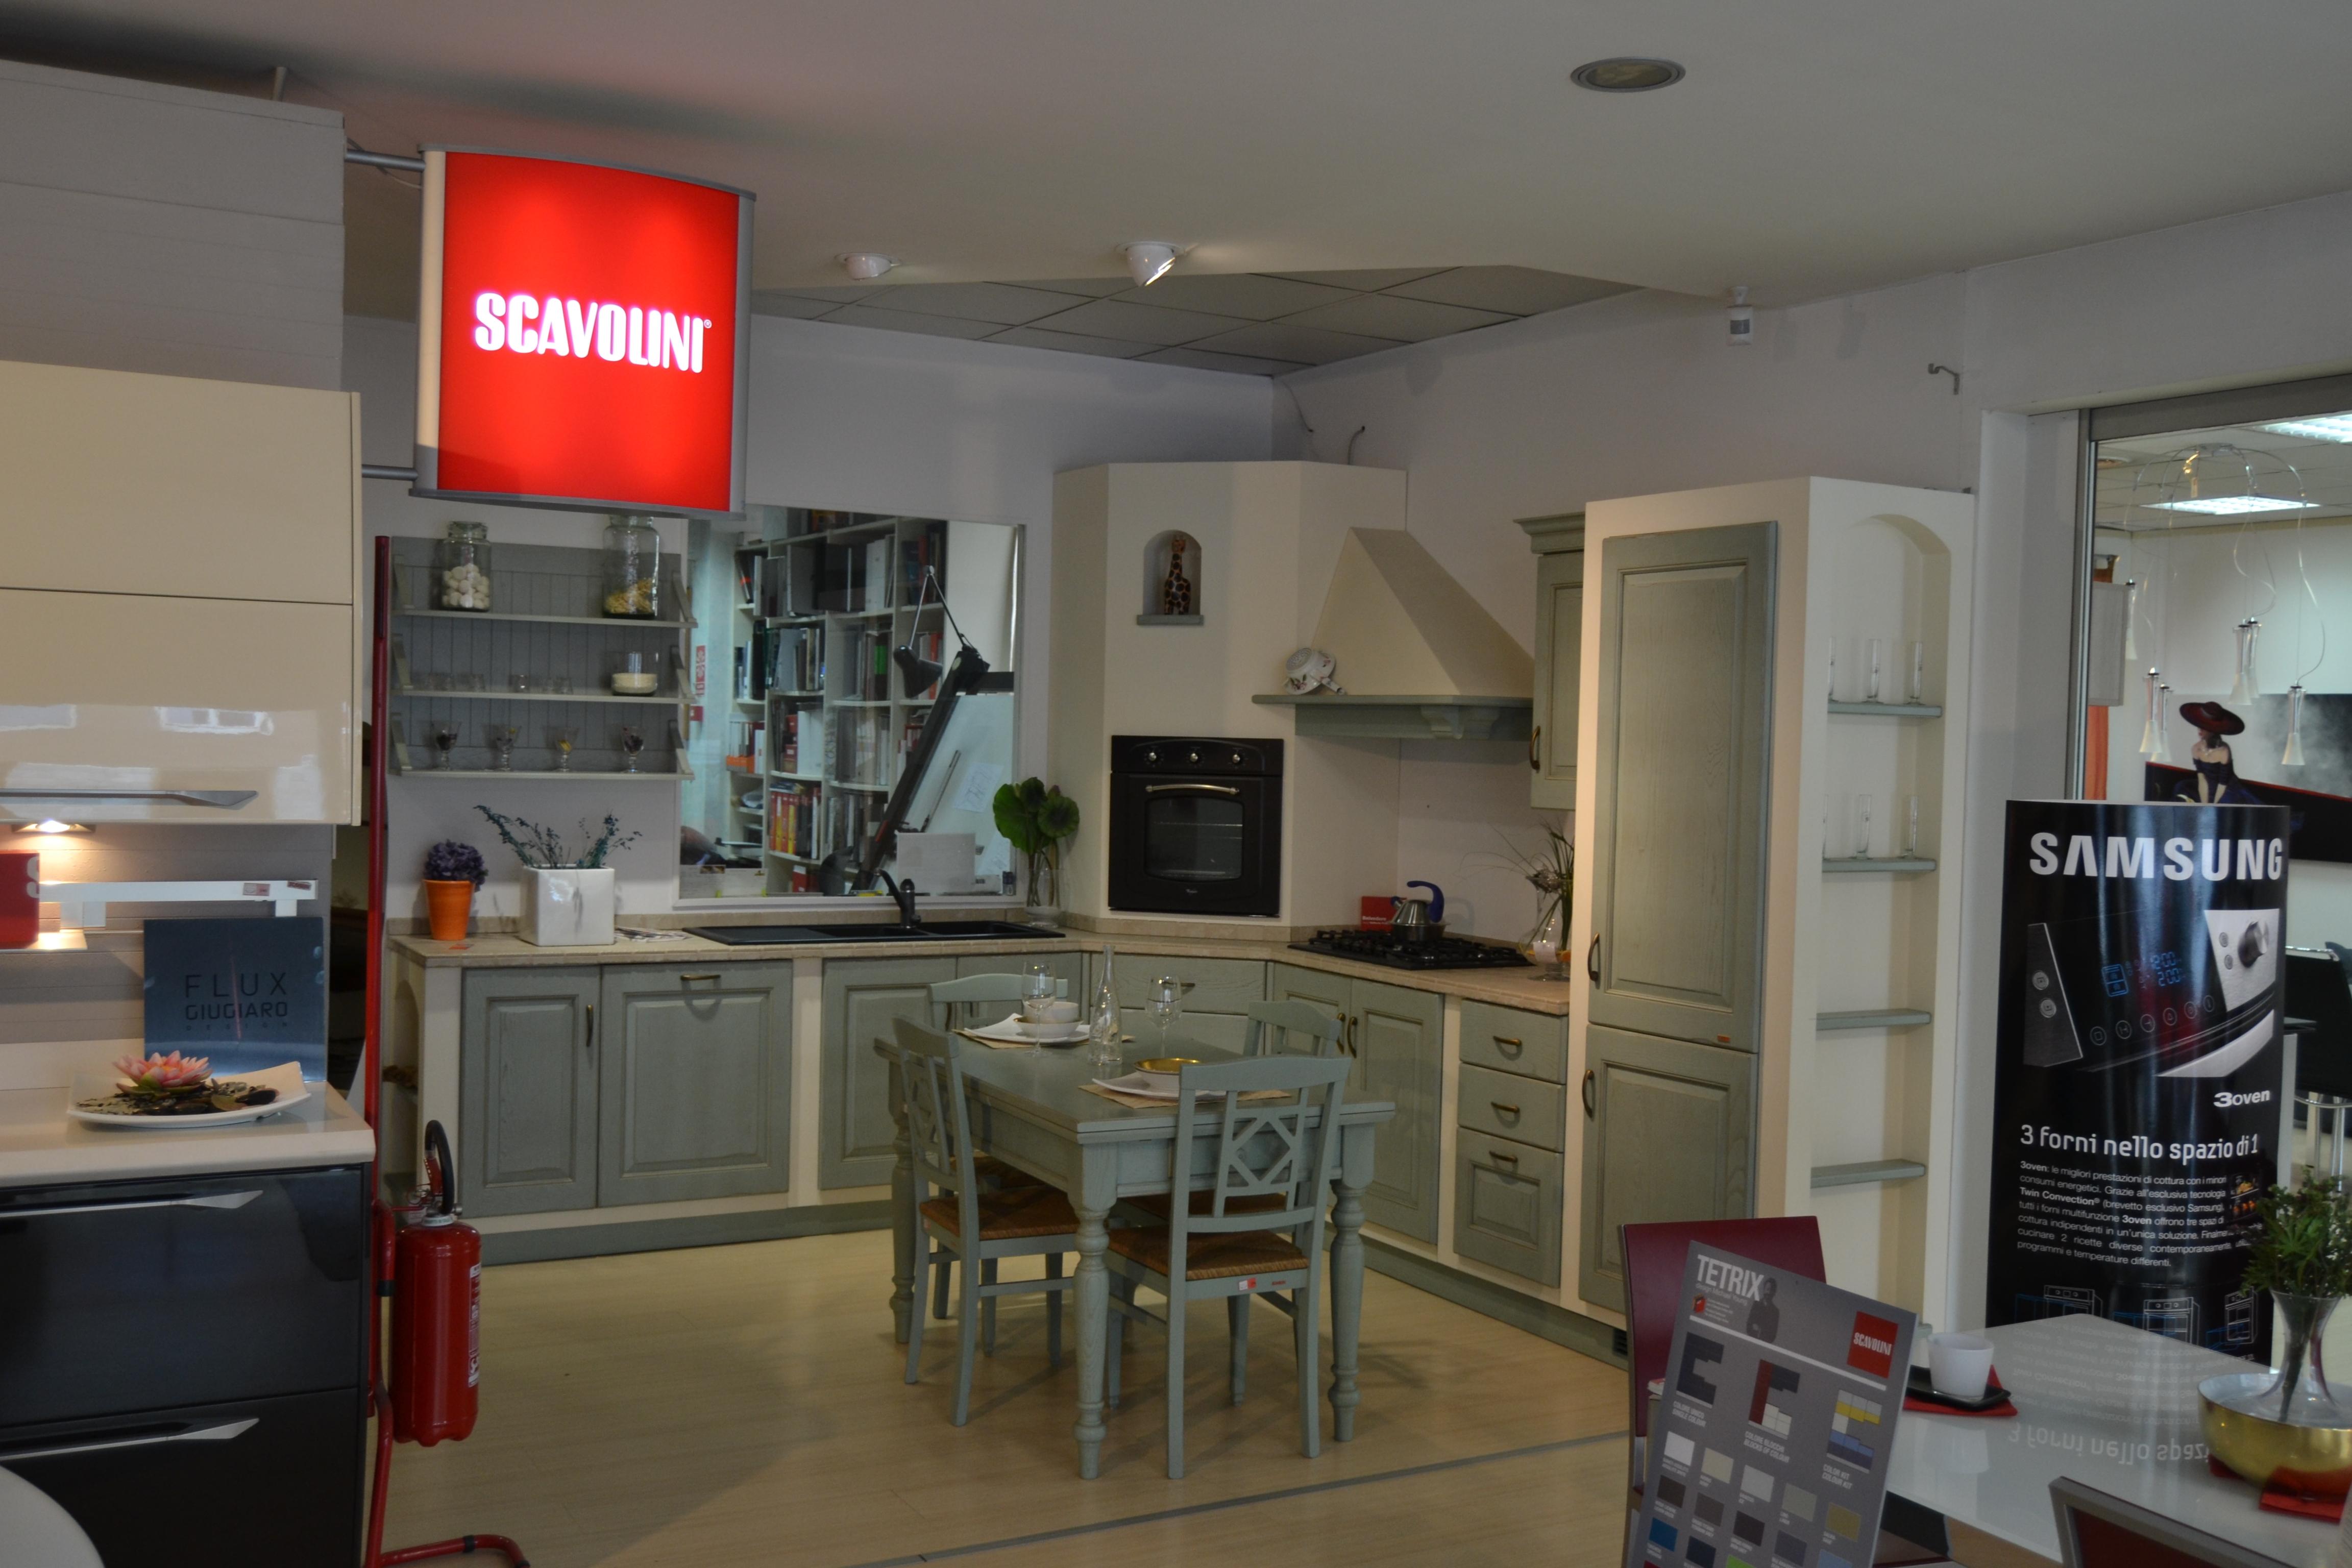 Scavolini belvedere cucine a prezzi scontati - Cucina belvedere scavolini ...